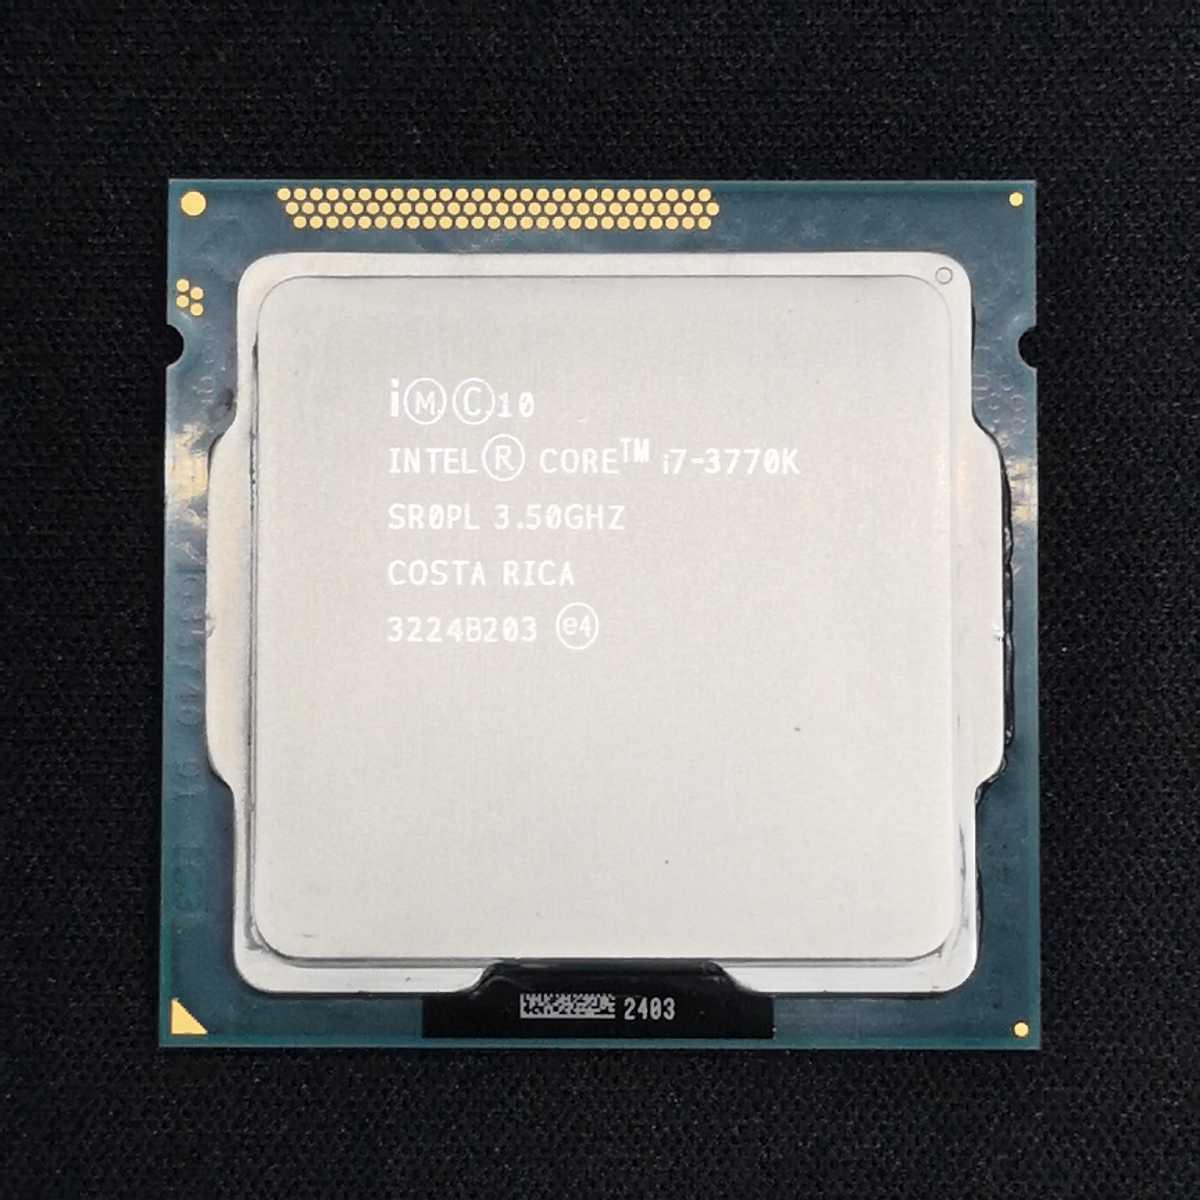 Core i7 3770k/3.5GHz/LGA1155/SR0PL/IvyBridge/中古動作品